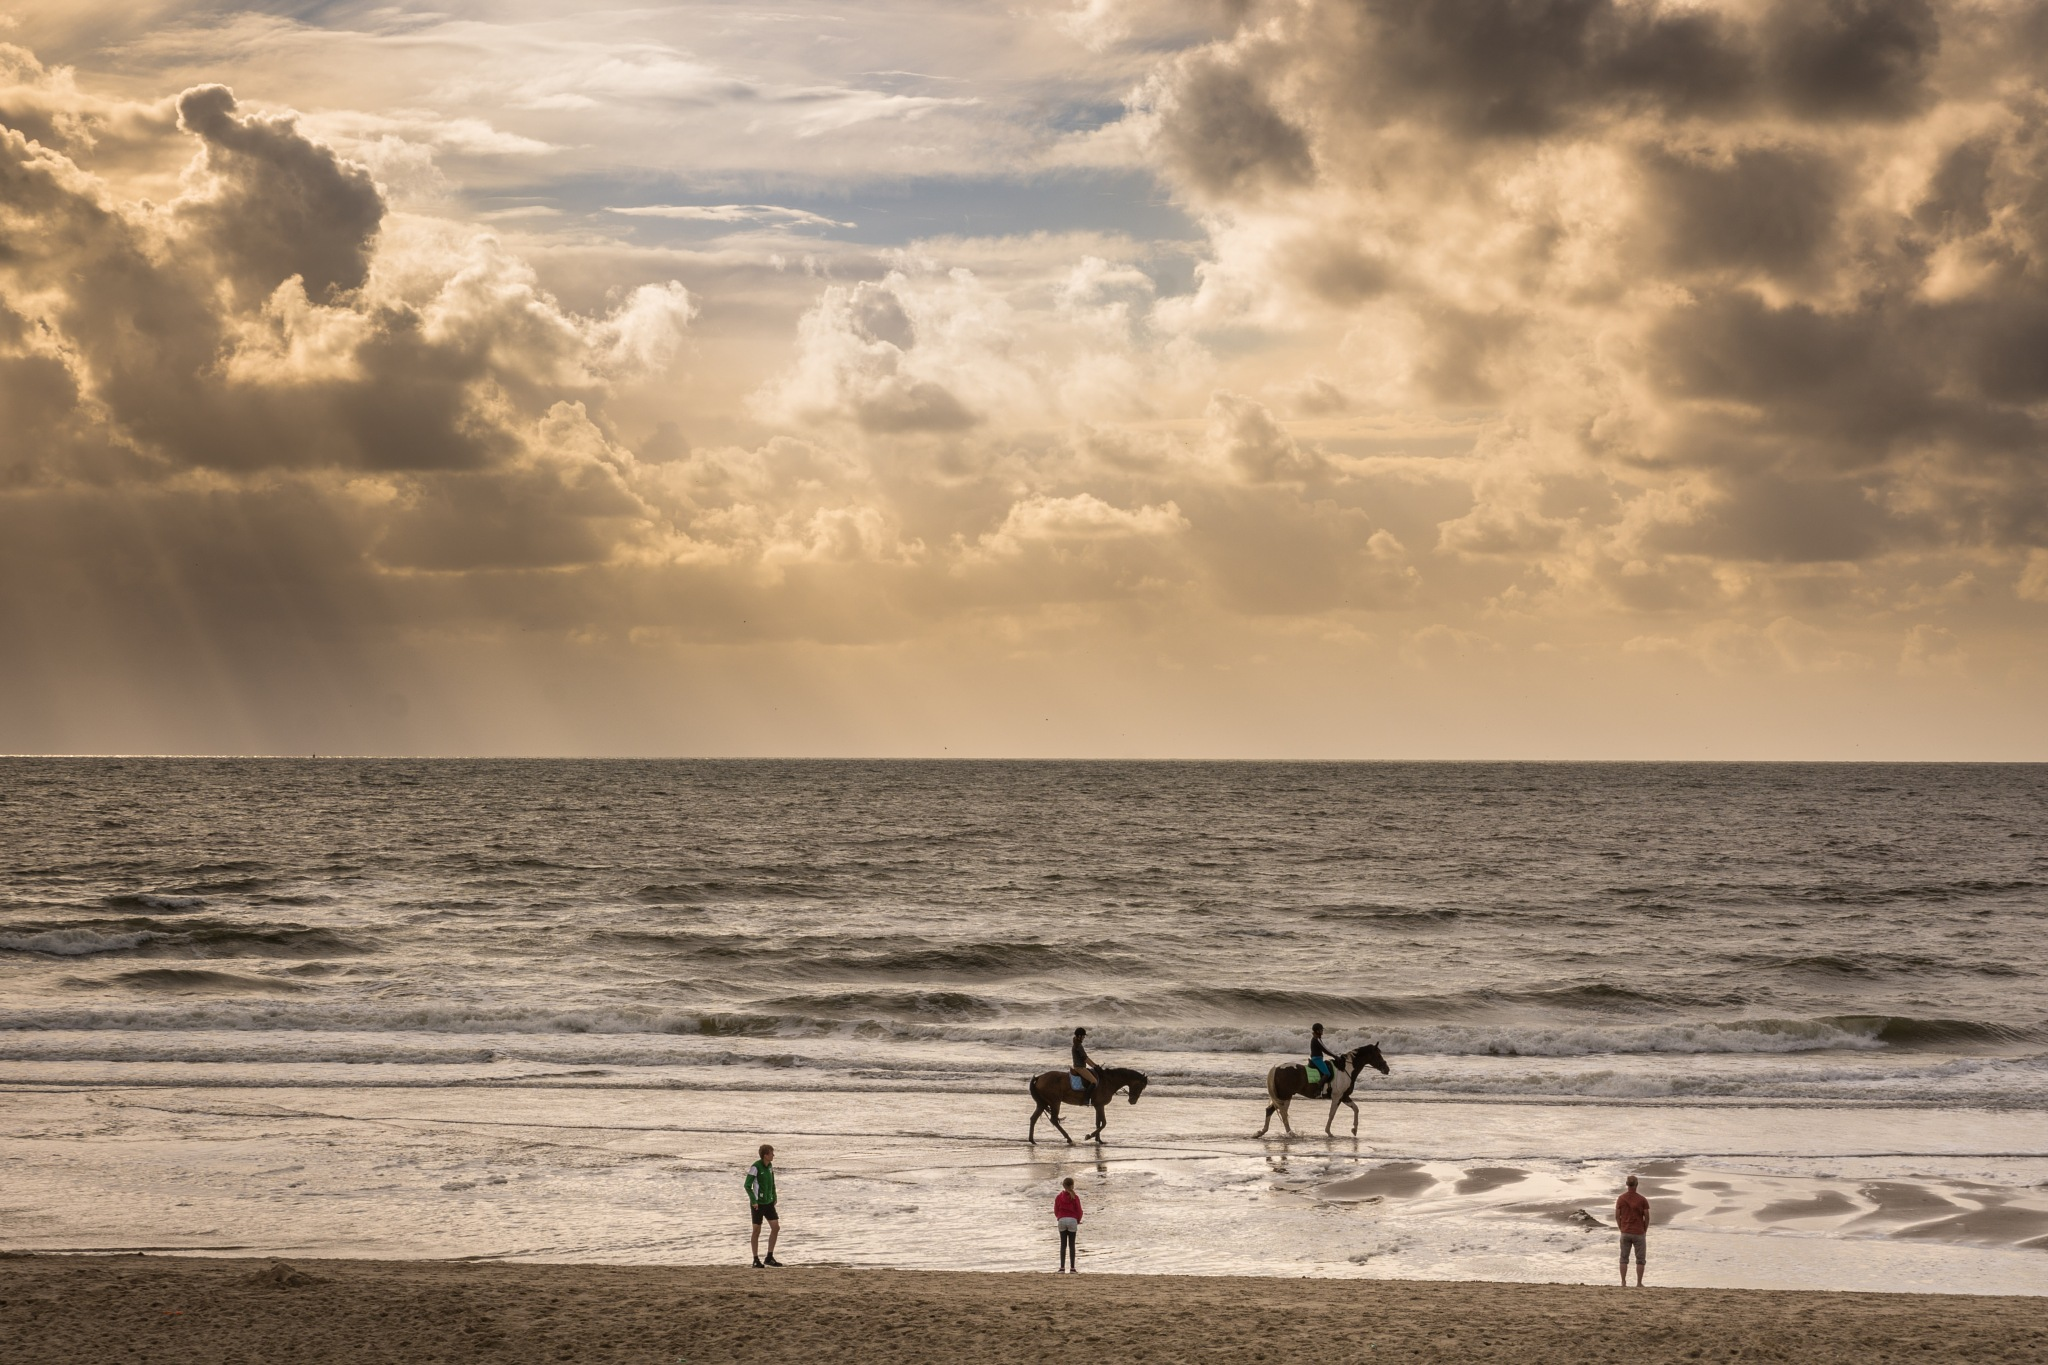 Riding down the beach by Men